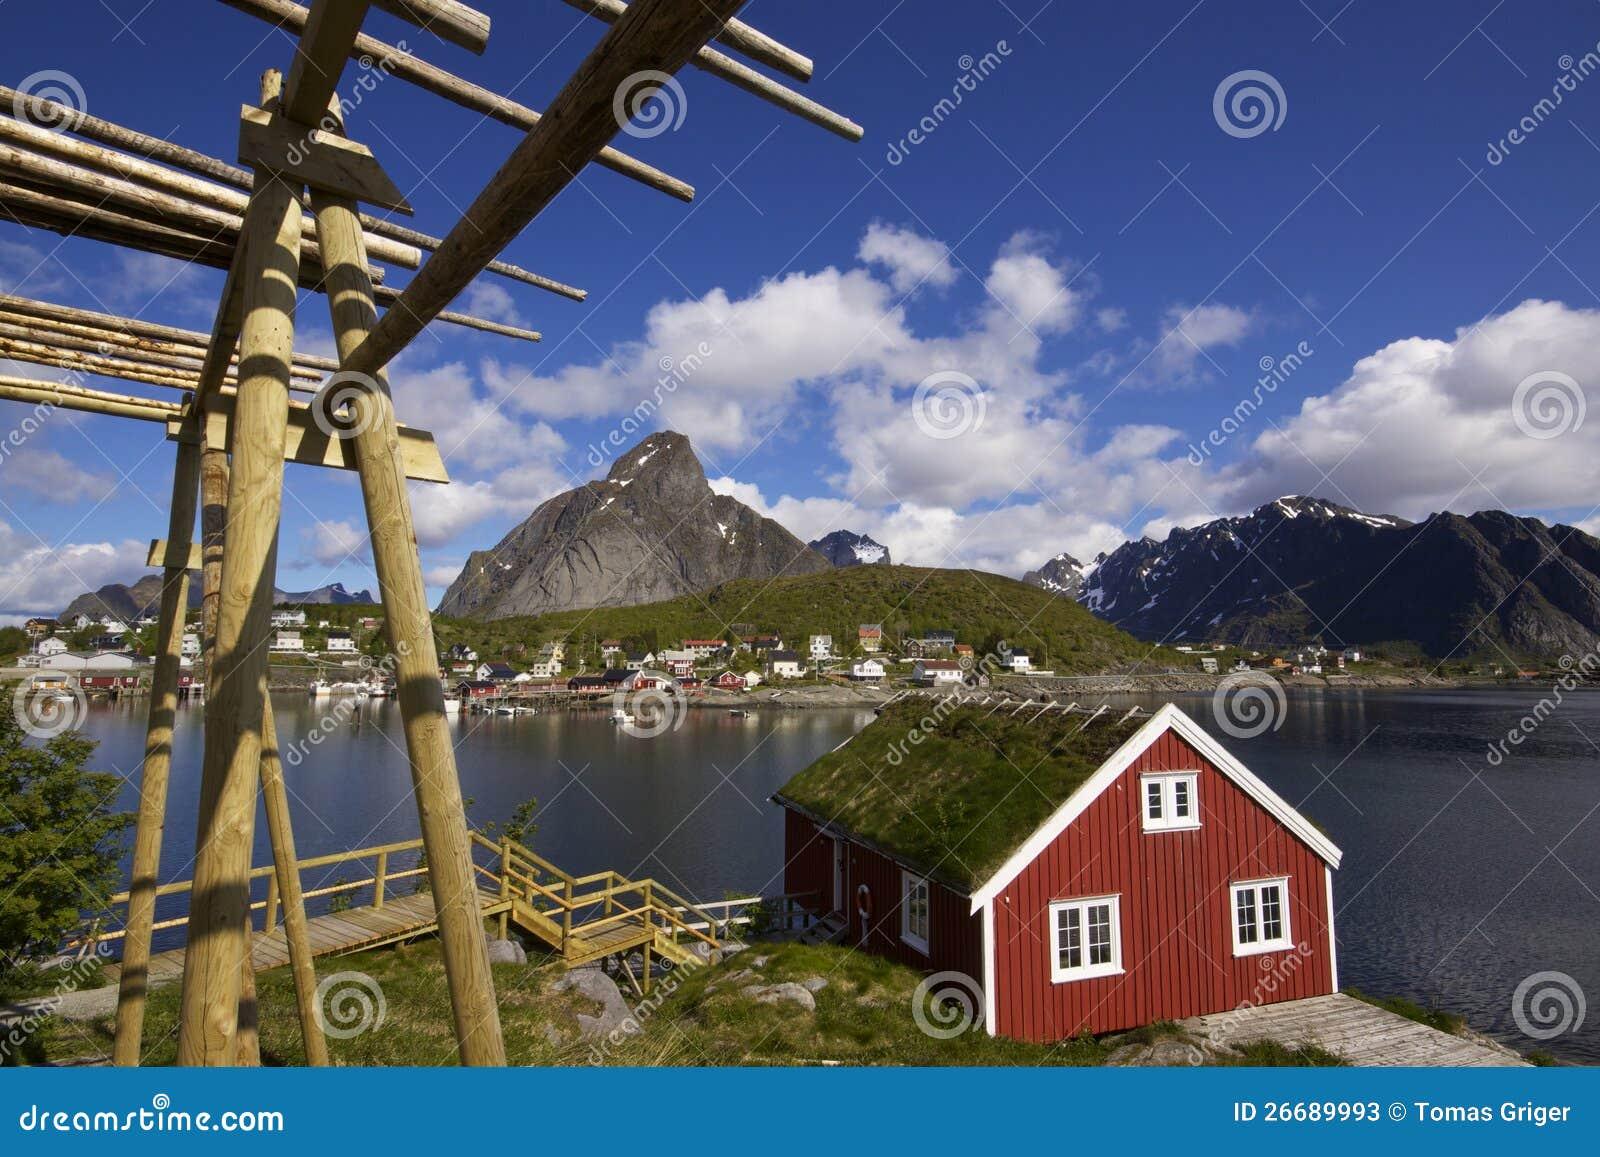 Fishing hut on Lofoten